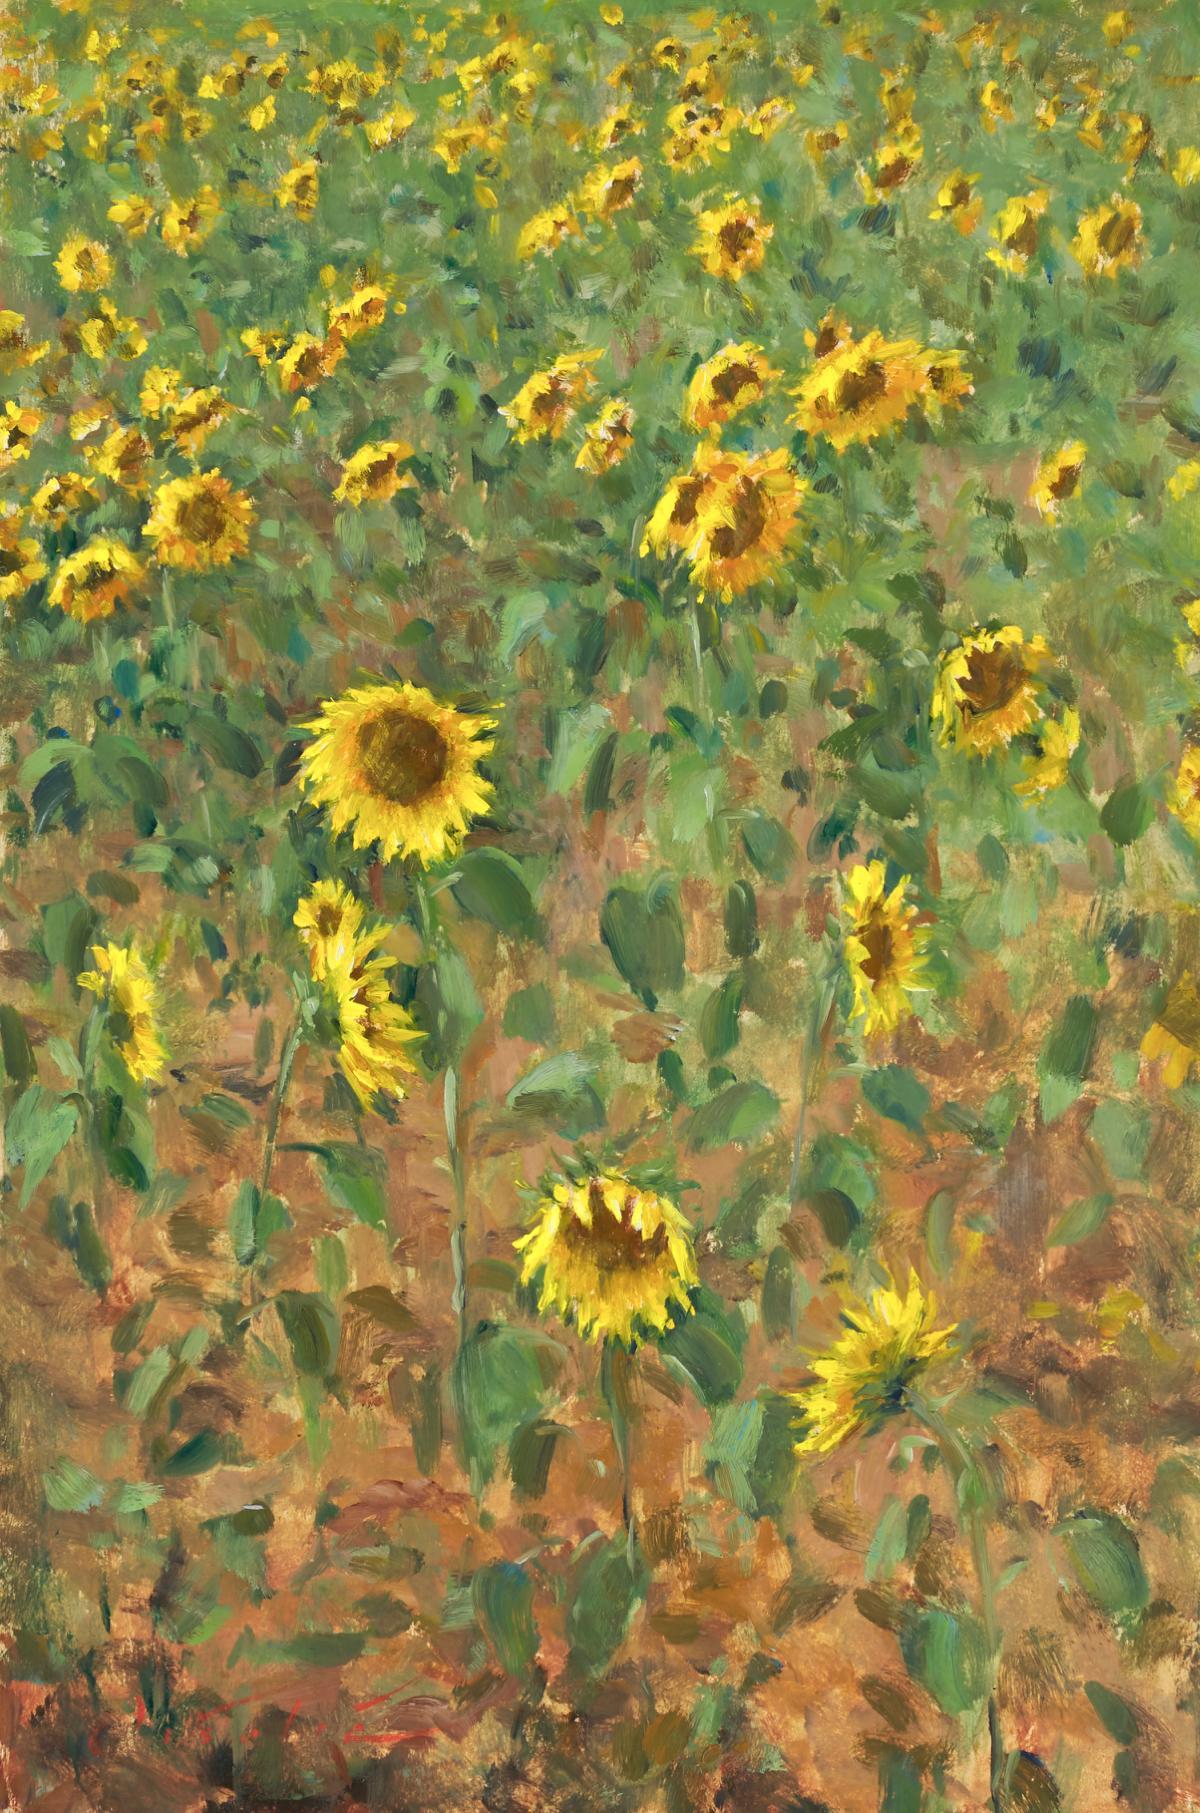 Sunflowers, Gers